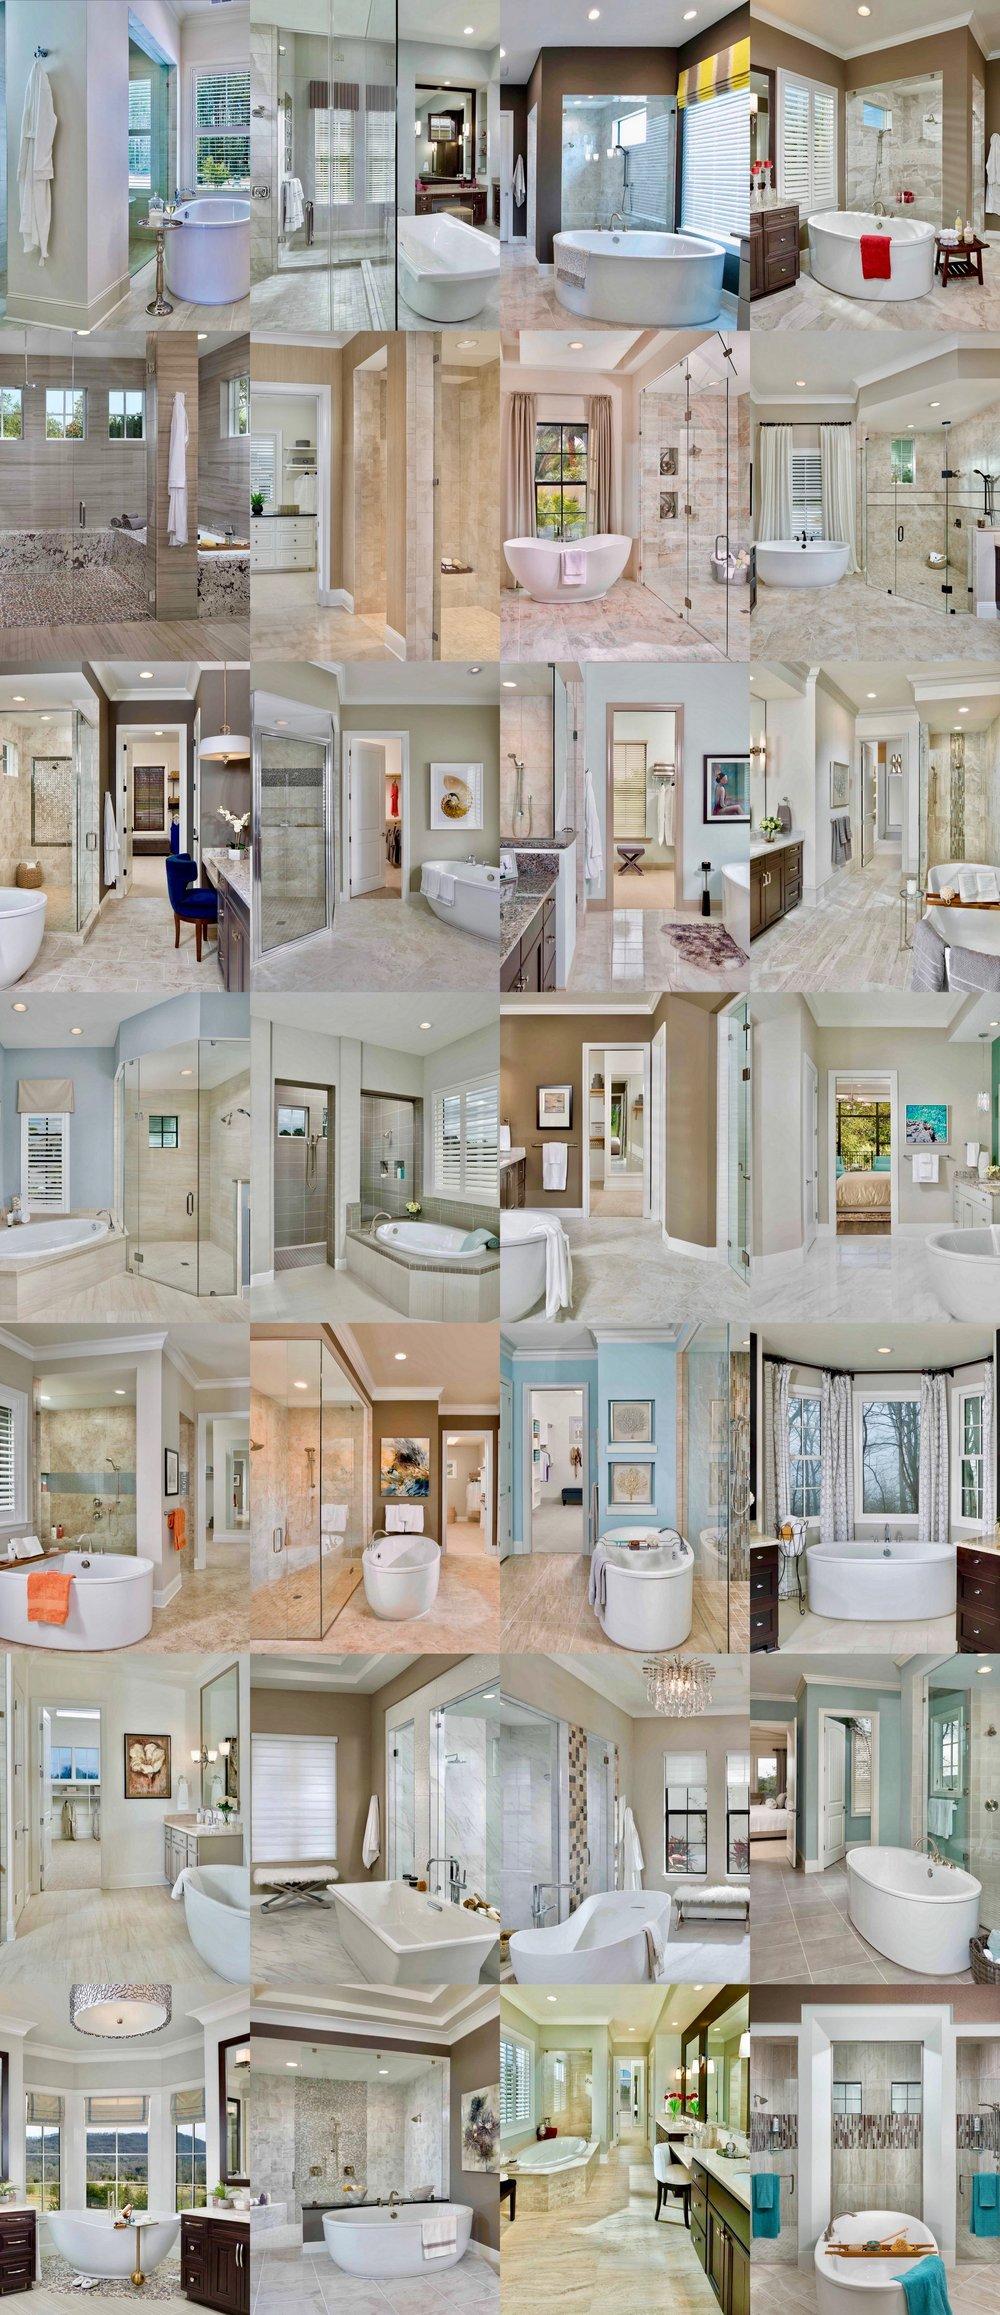 28 Arousing Master Bathroom Designs @arthurrutenberg